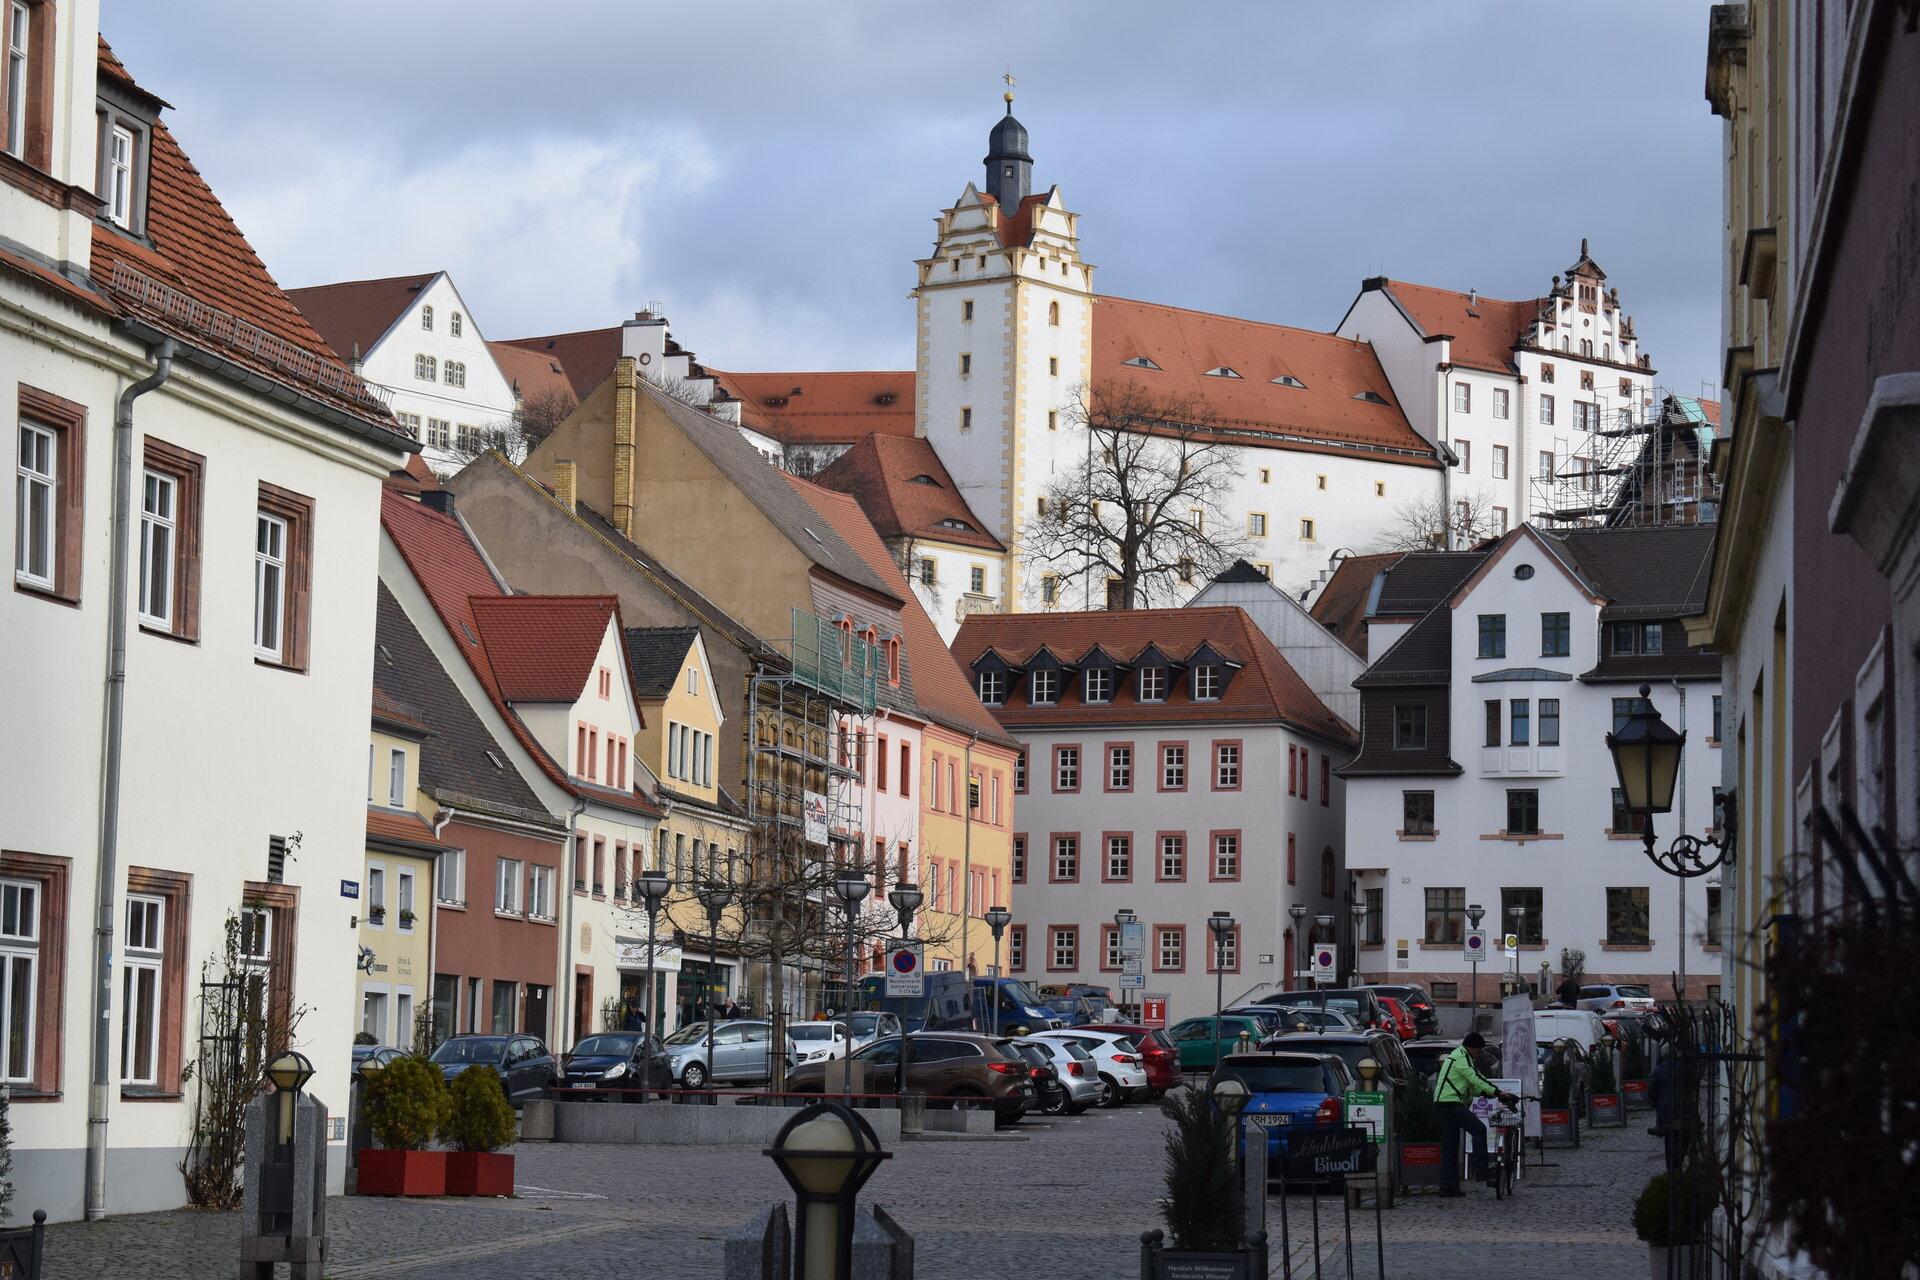 Markt mit Blick zum Schloss